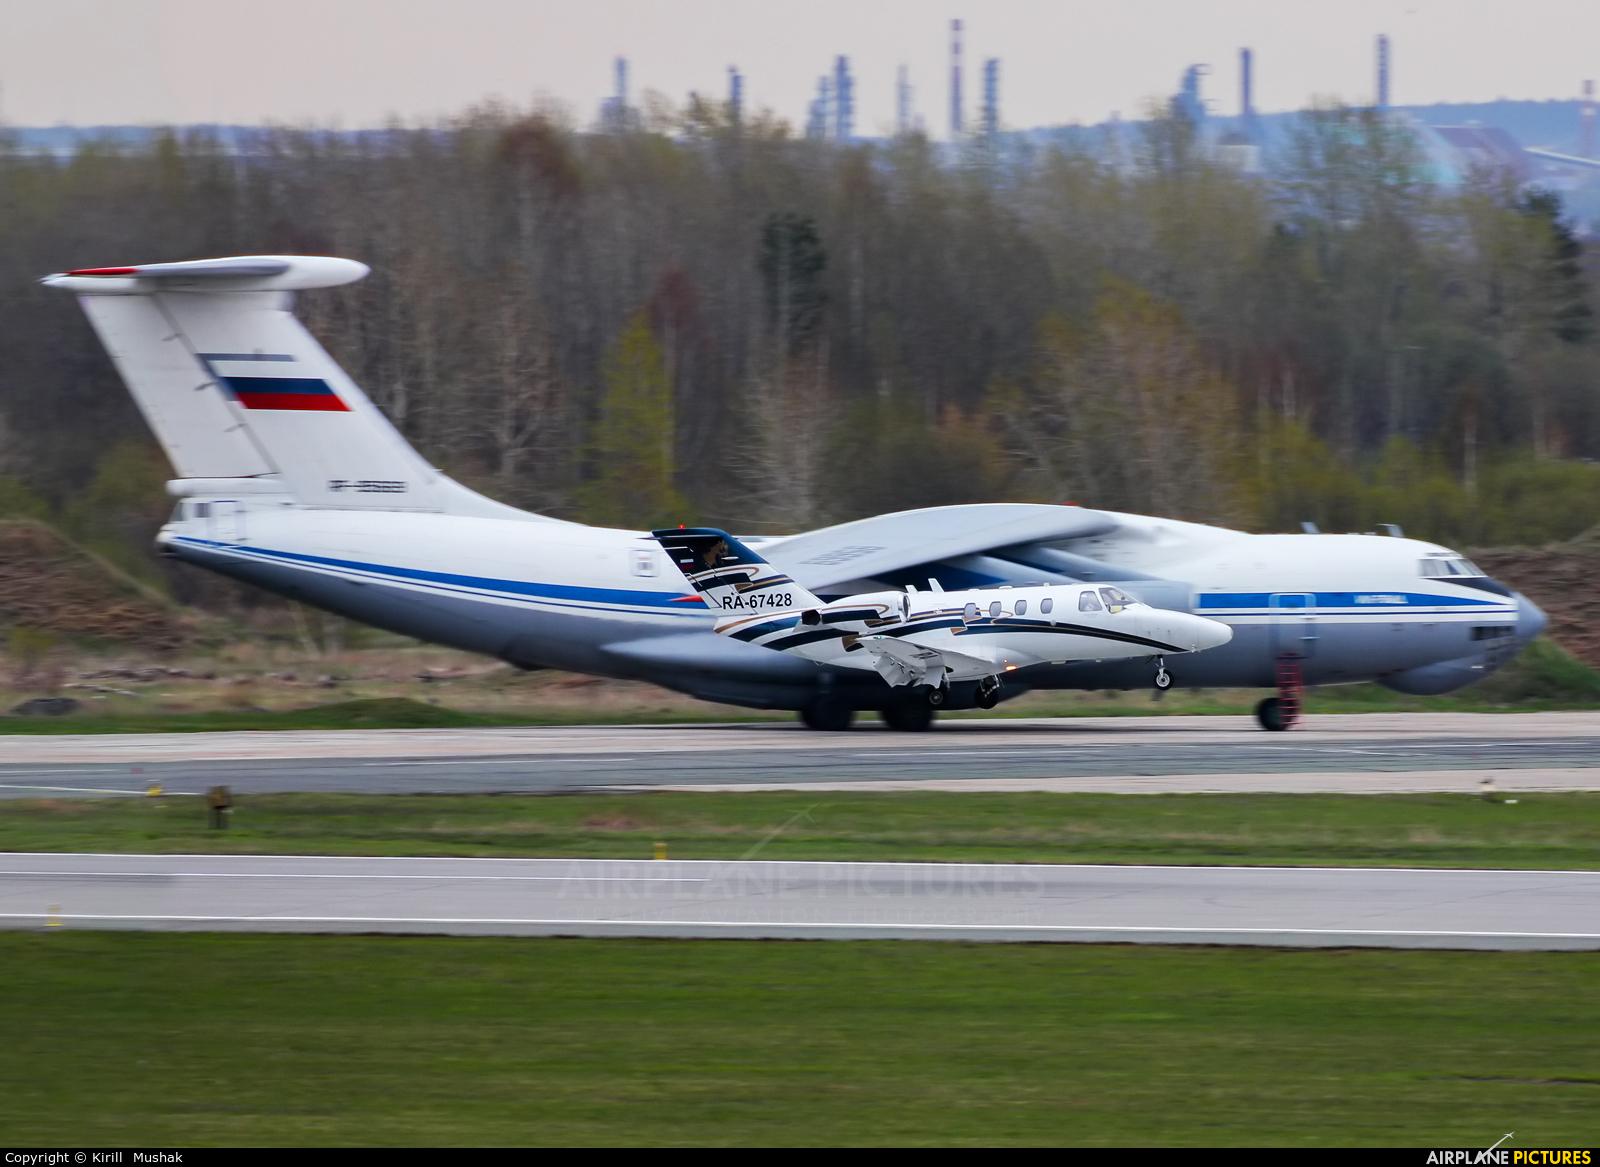 Aerolimousine Airline RA-67428 aircraft at Bolshoe Savino - Perm